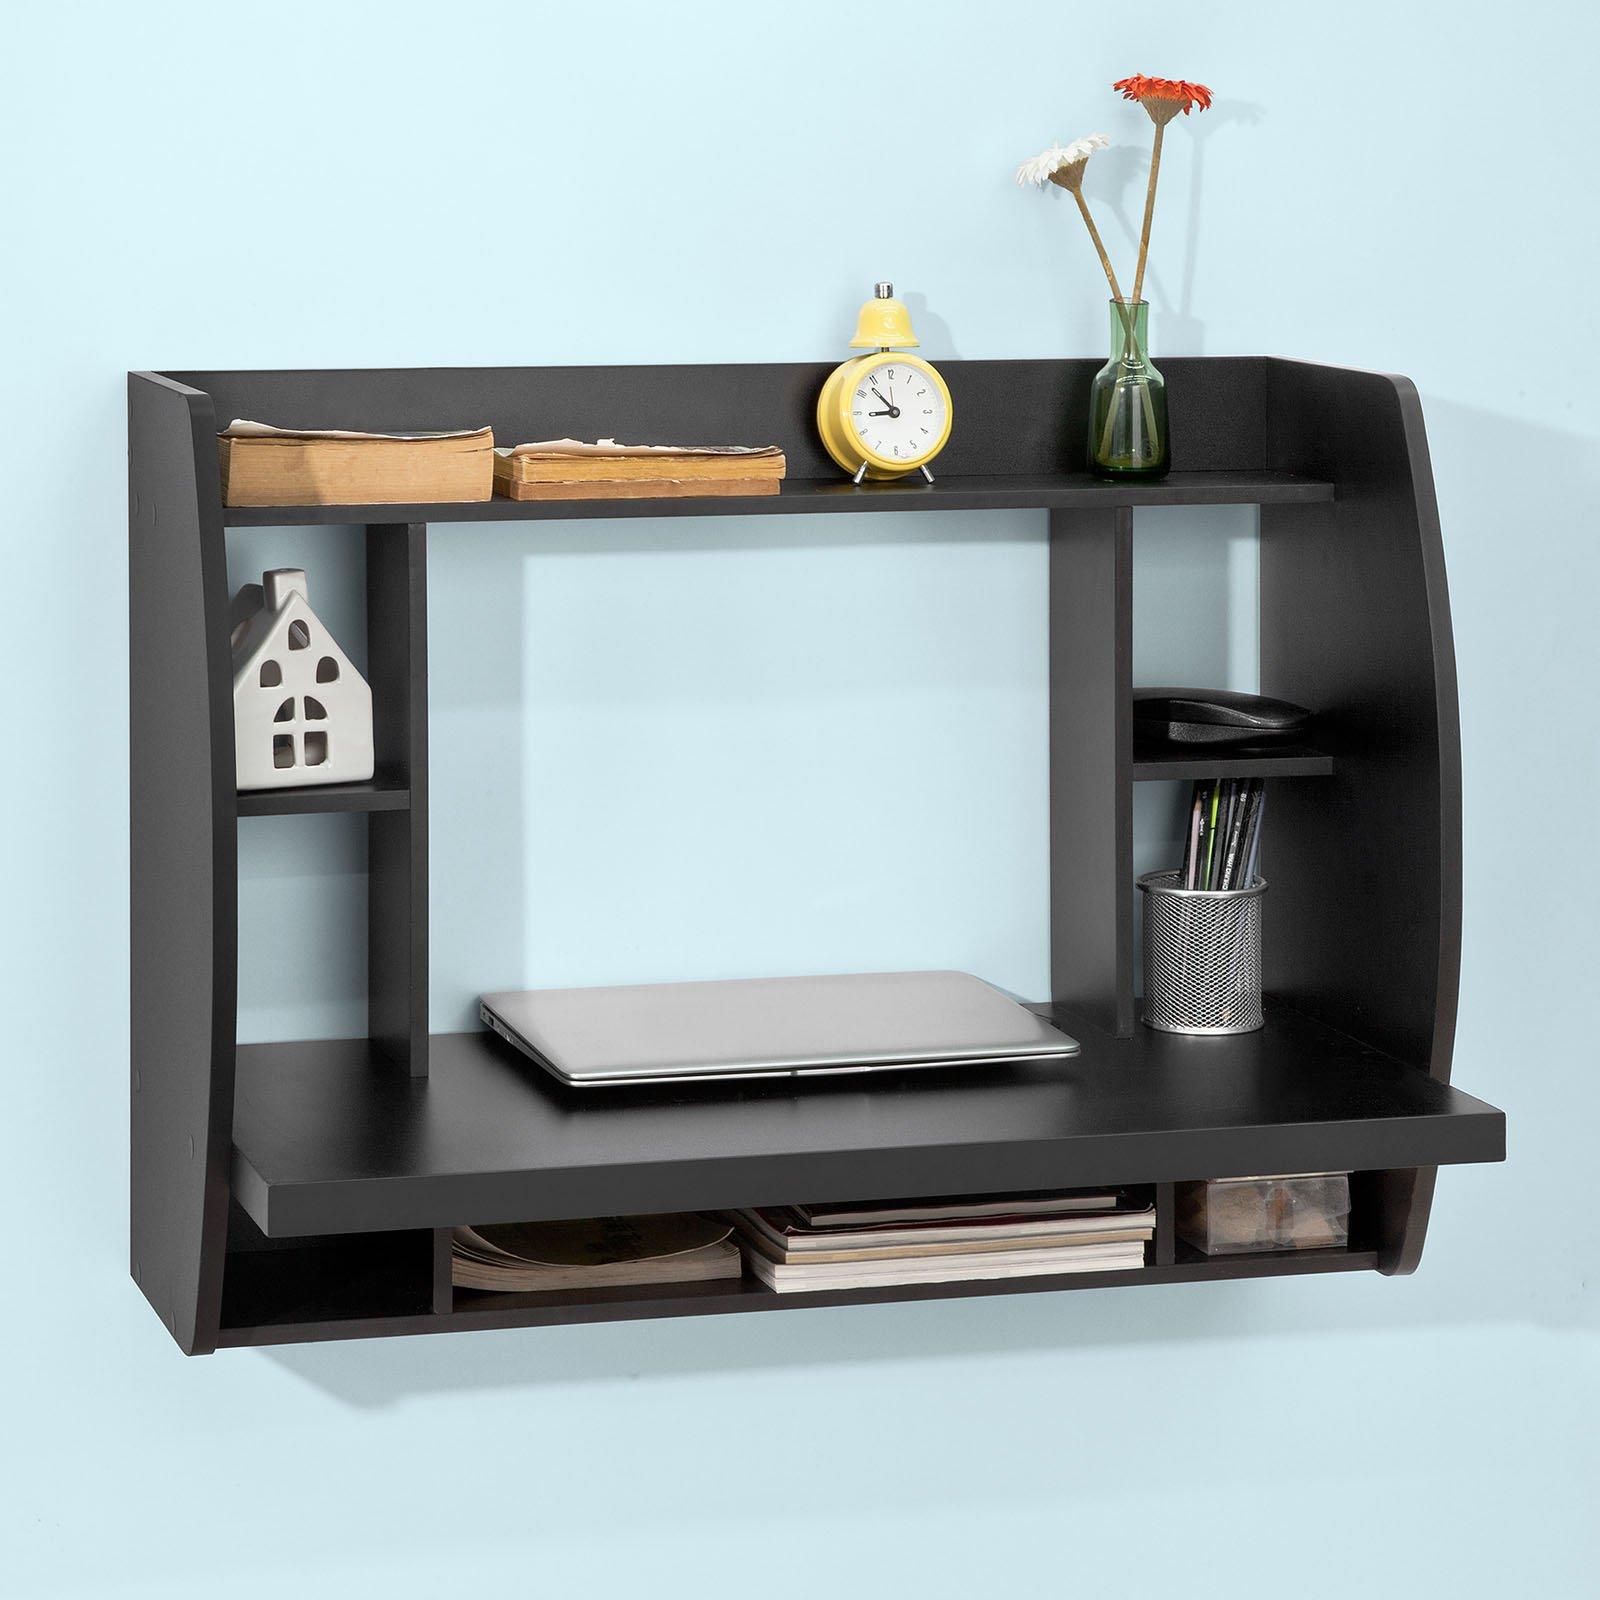 Haotian Wall-mounted Drop-leaf Table, Folding Kitchen & Dining Table Desk, Solid Wood Children Table,Home Office Table Desk Workstation Computer Desk with Storage Shelves, Trestle Desk (FWT18-SCH)